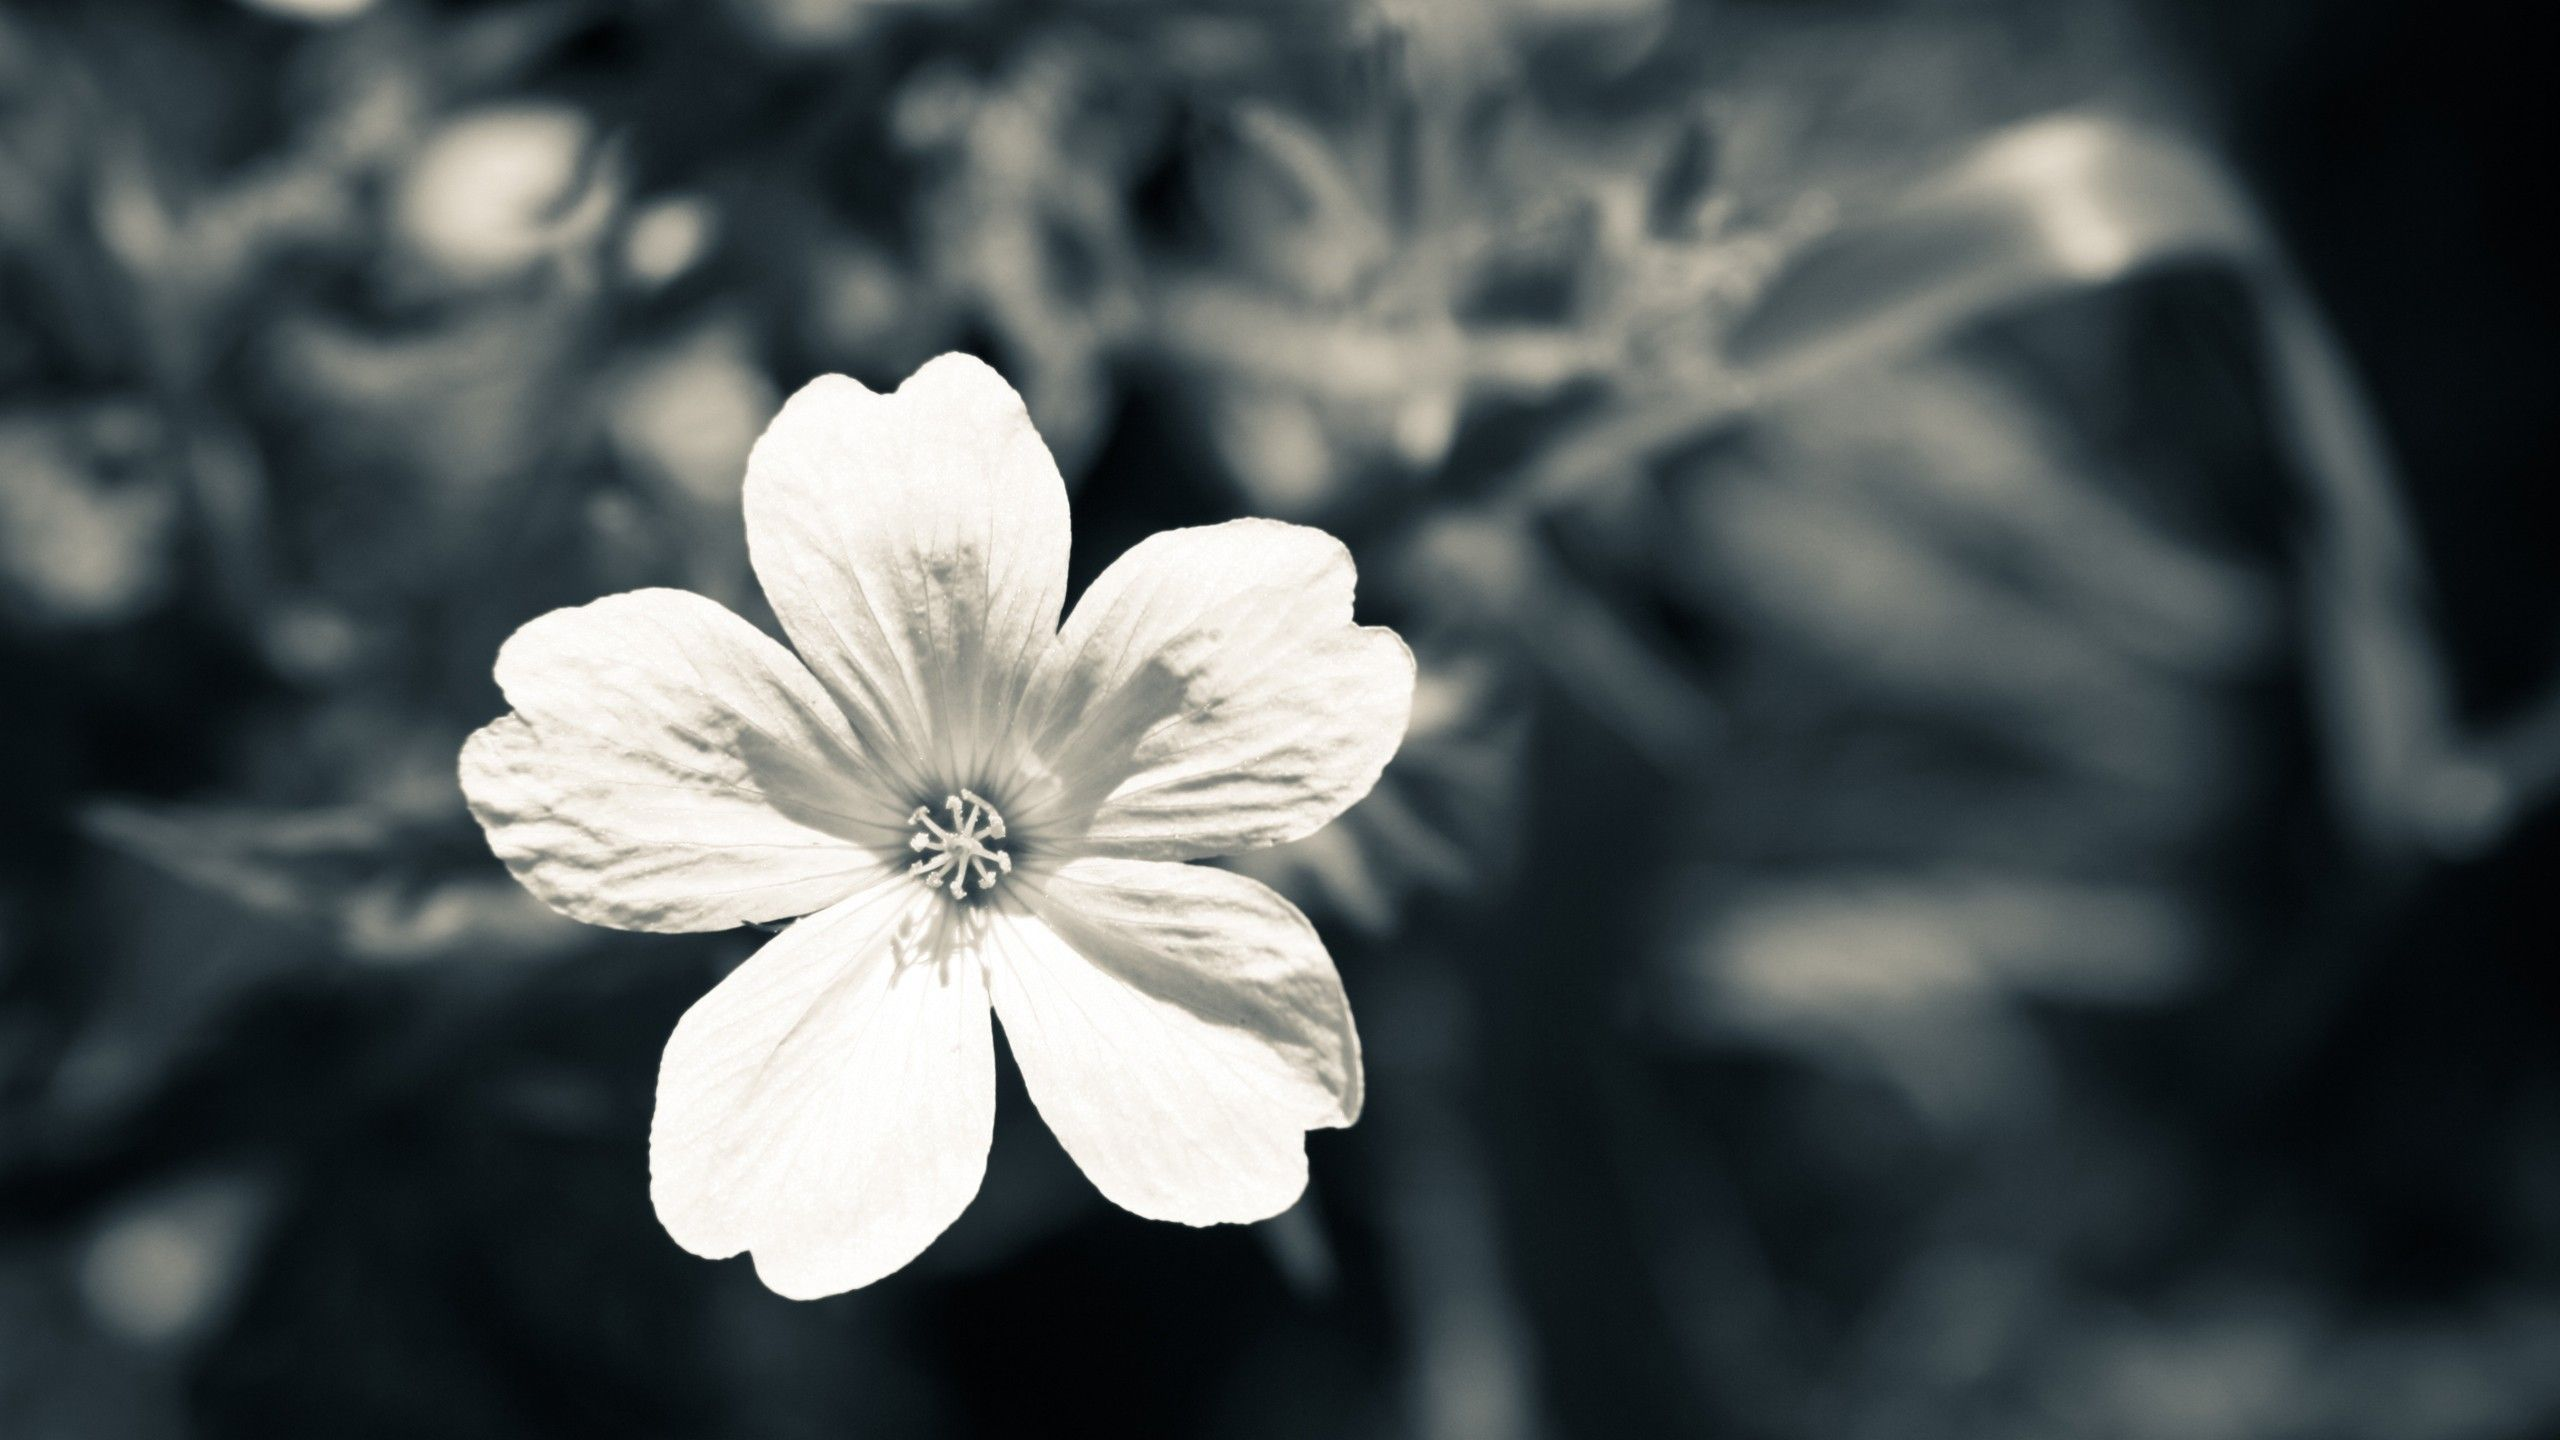 macro, monochrome, flowers, nature, wallpaper